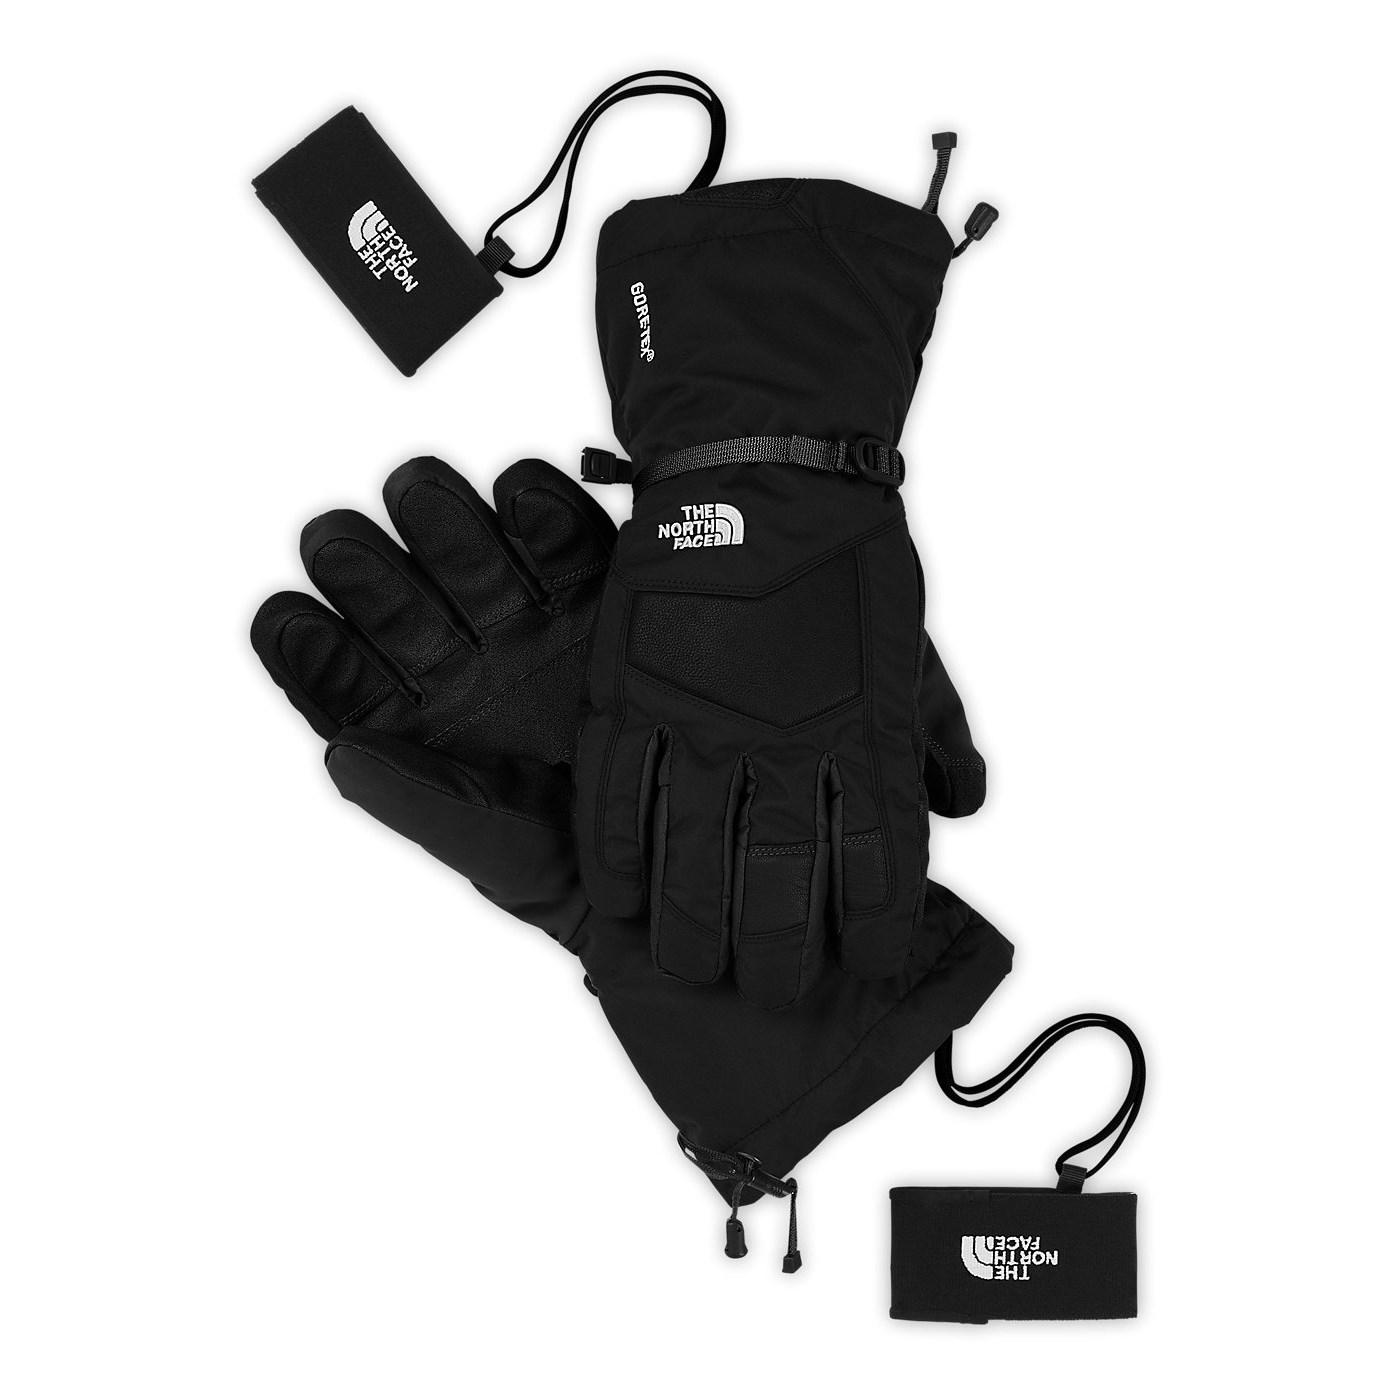 cdfaa00c9 The North Face Powderflo Gloves - Women's   evo